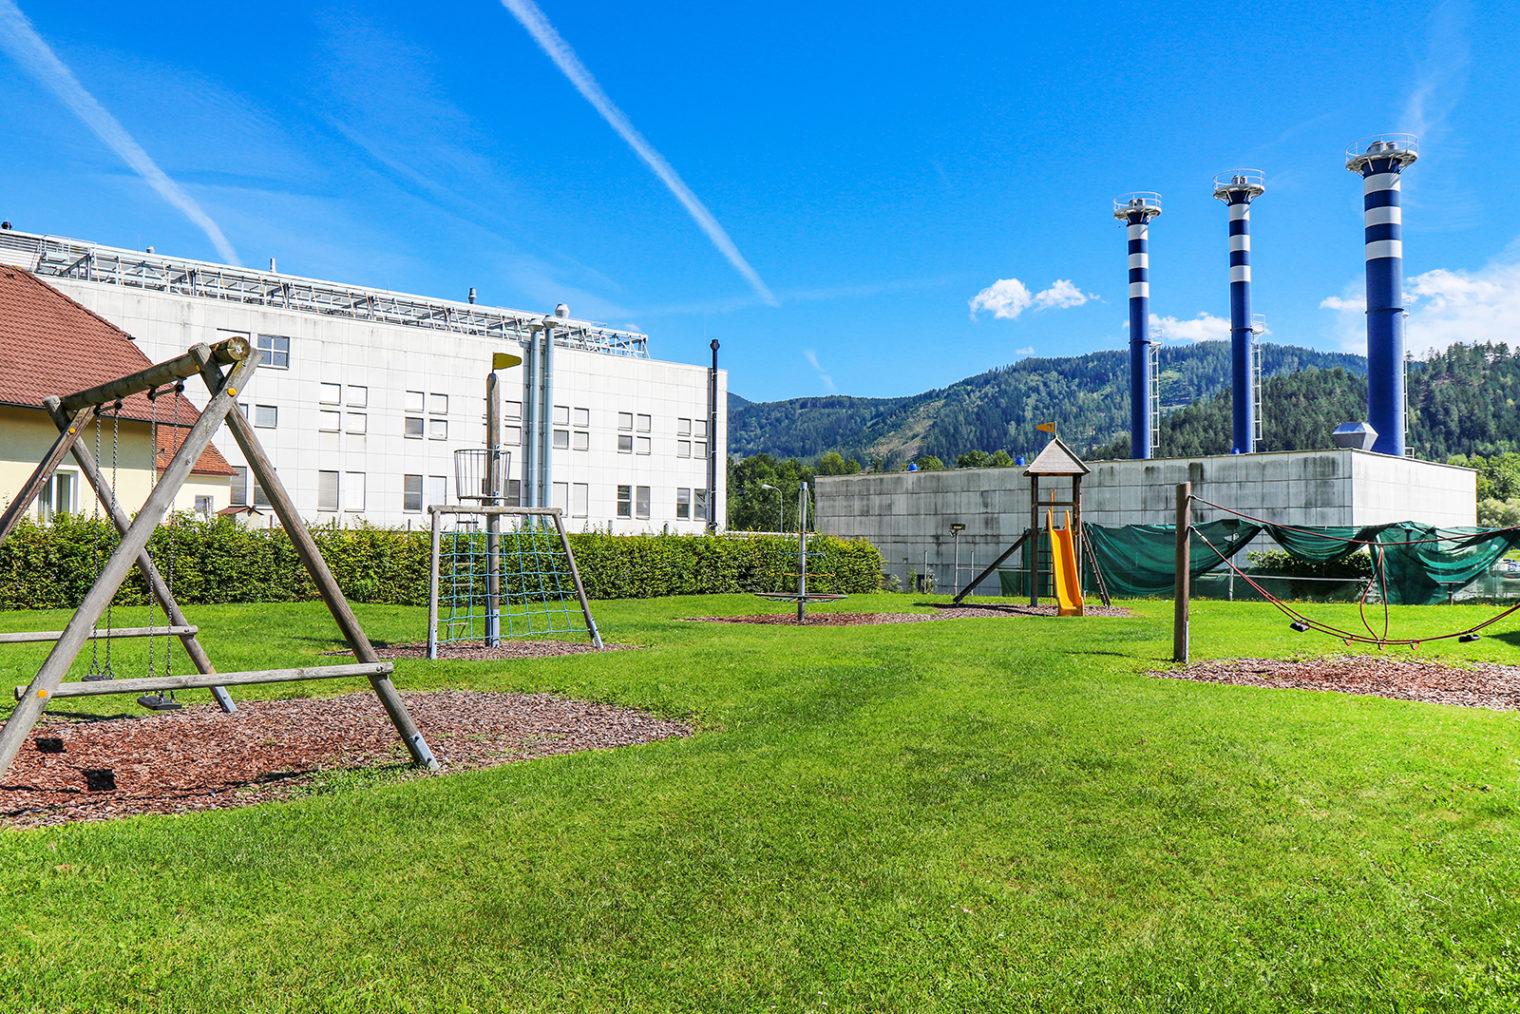 Play equipment at the SV Hinterberg playground